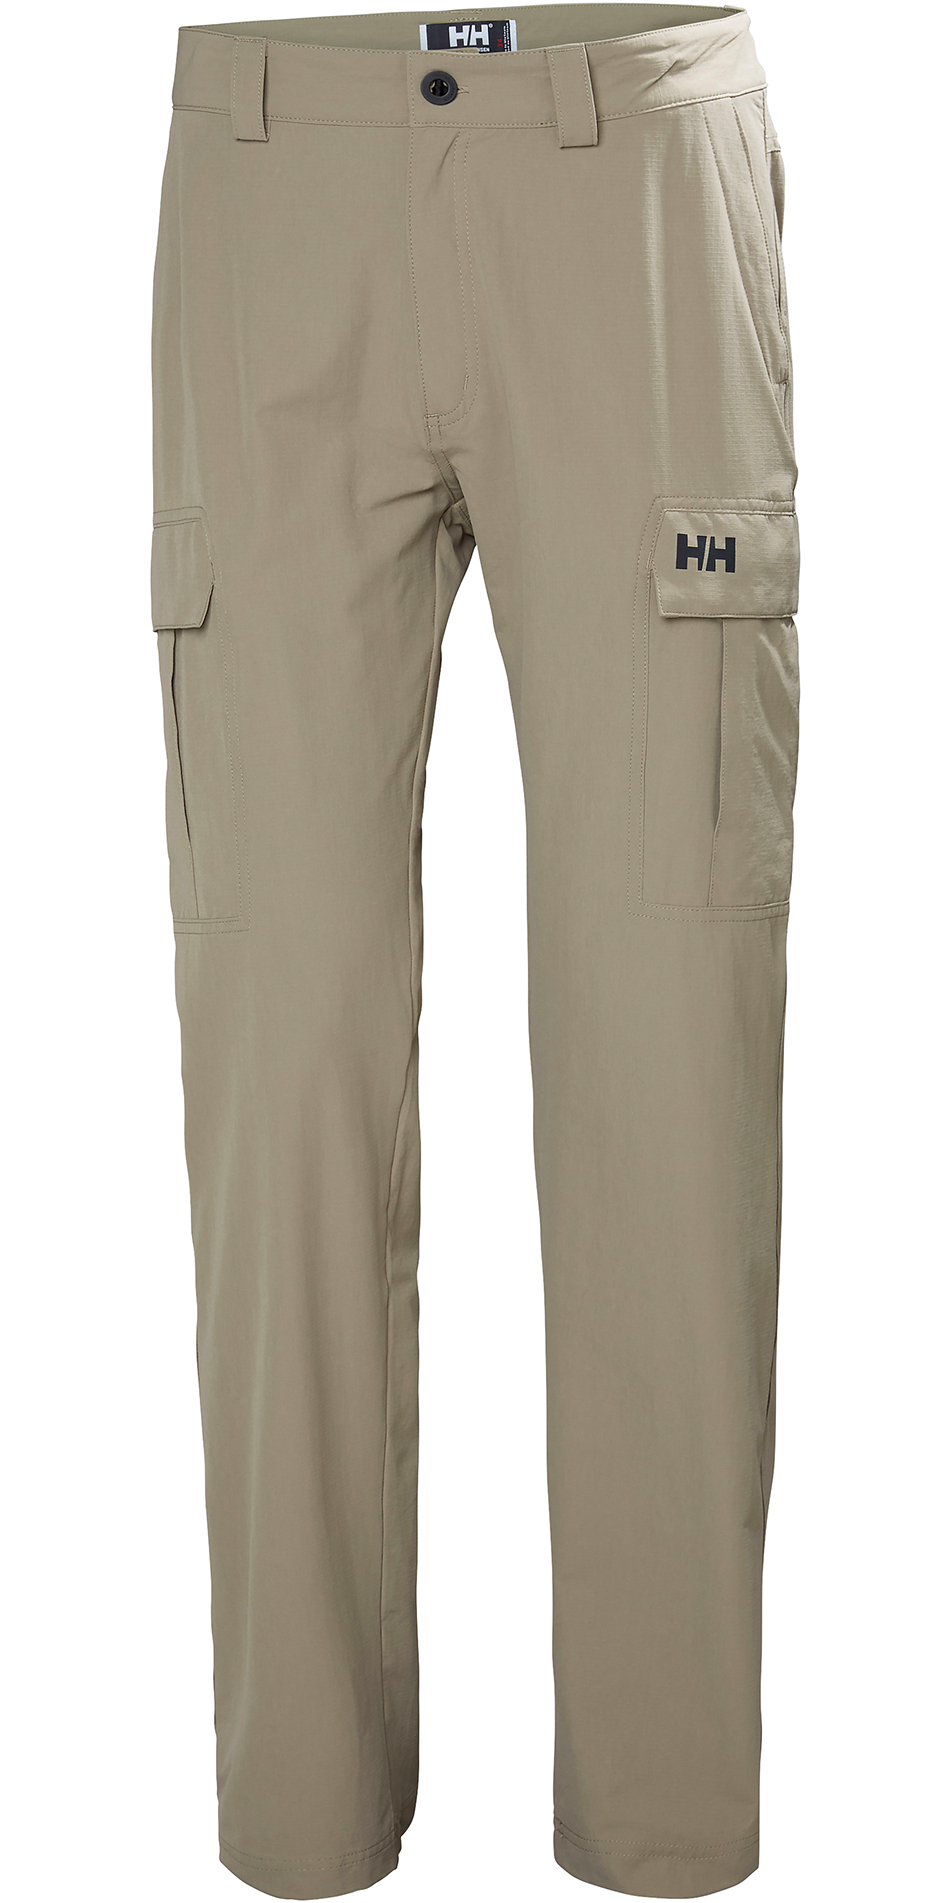 the latest 32b93 71df0 2019 Helly Hansen QD Cargo Trousers Fallen Rock 33996